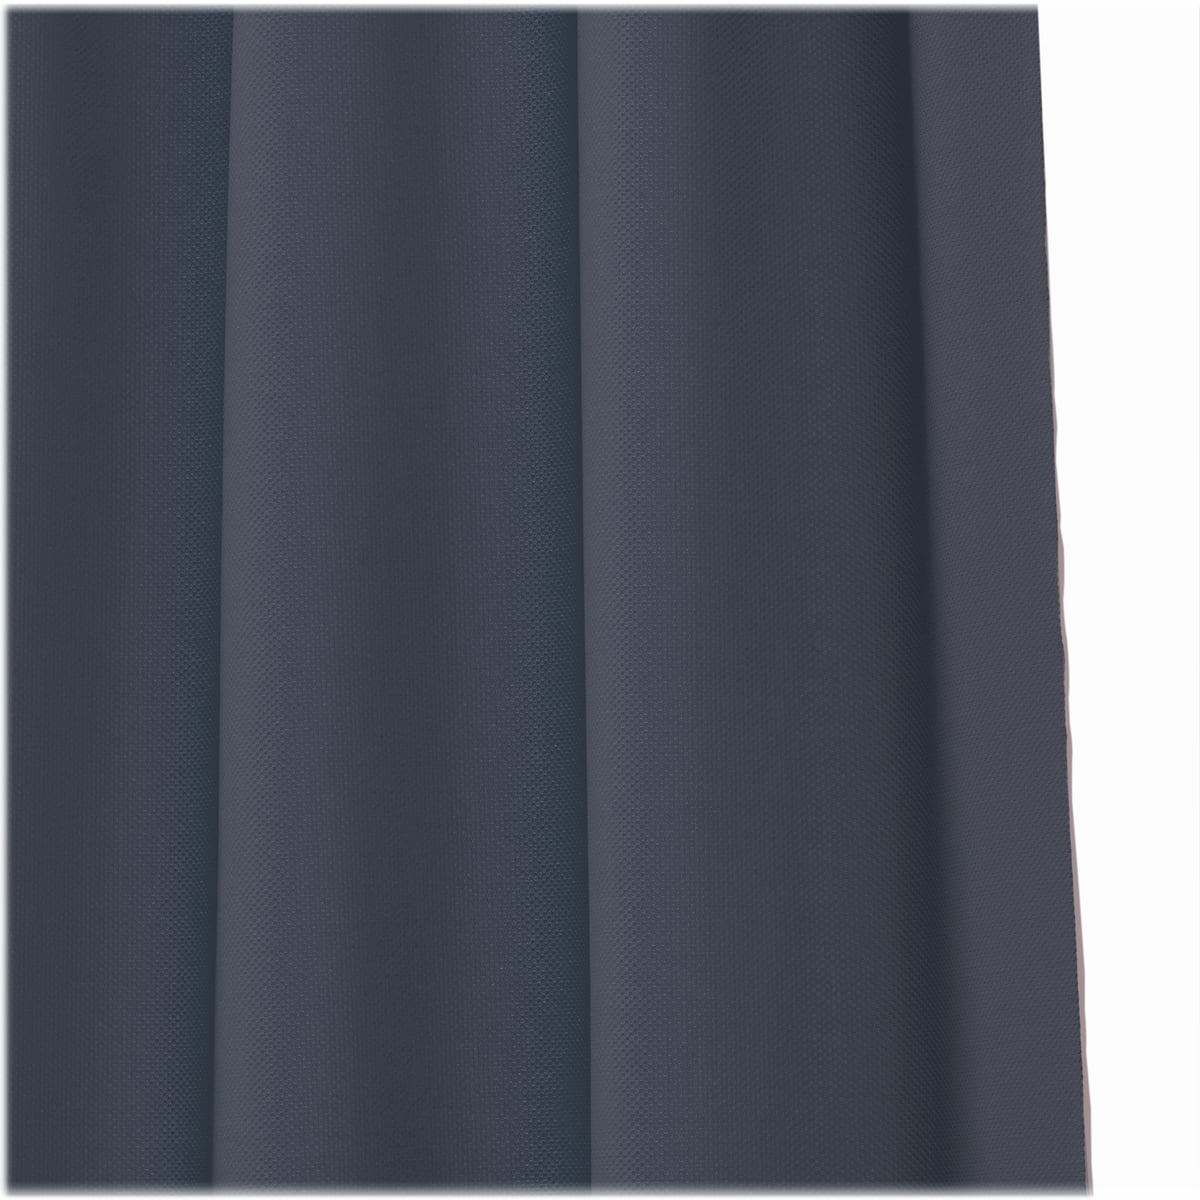 Ready Made Curtain Ace 200 x 290 cm 182 von Kvadrat